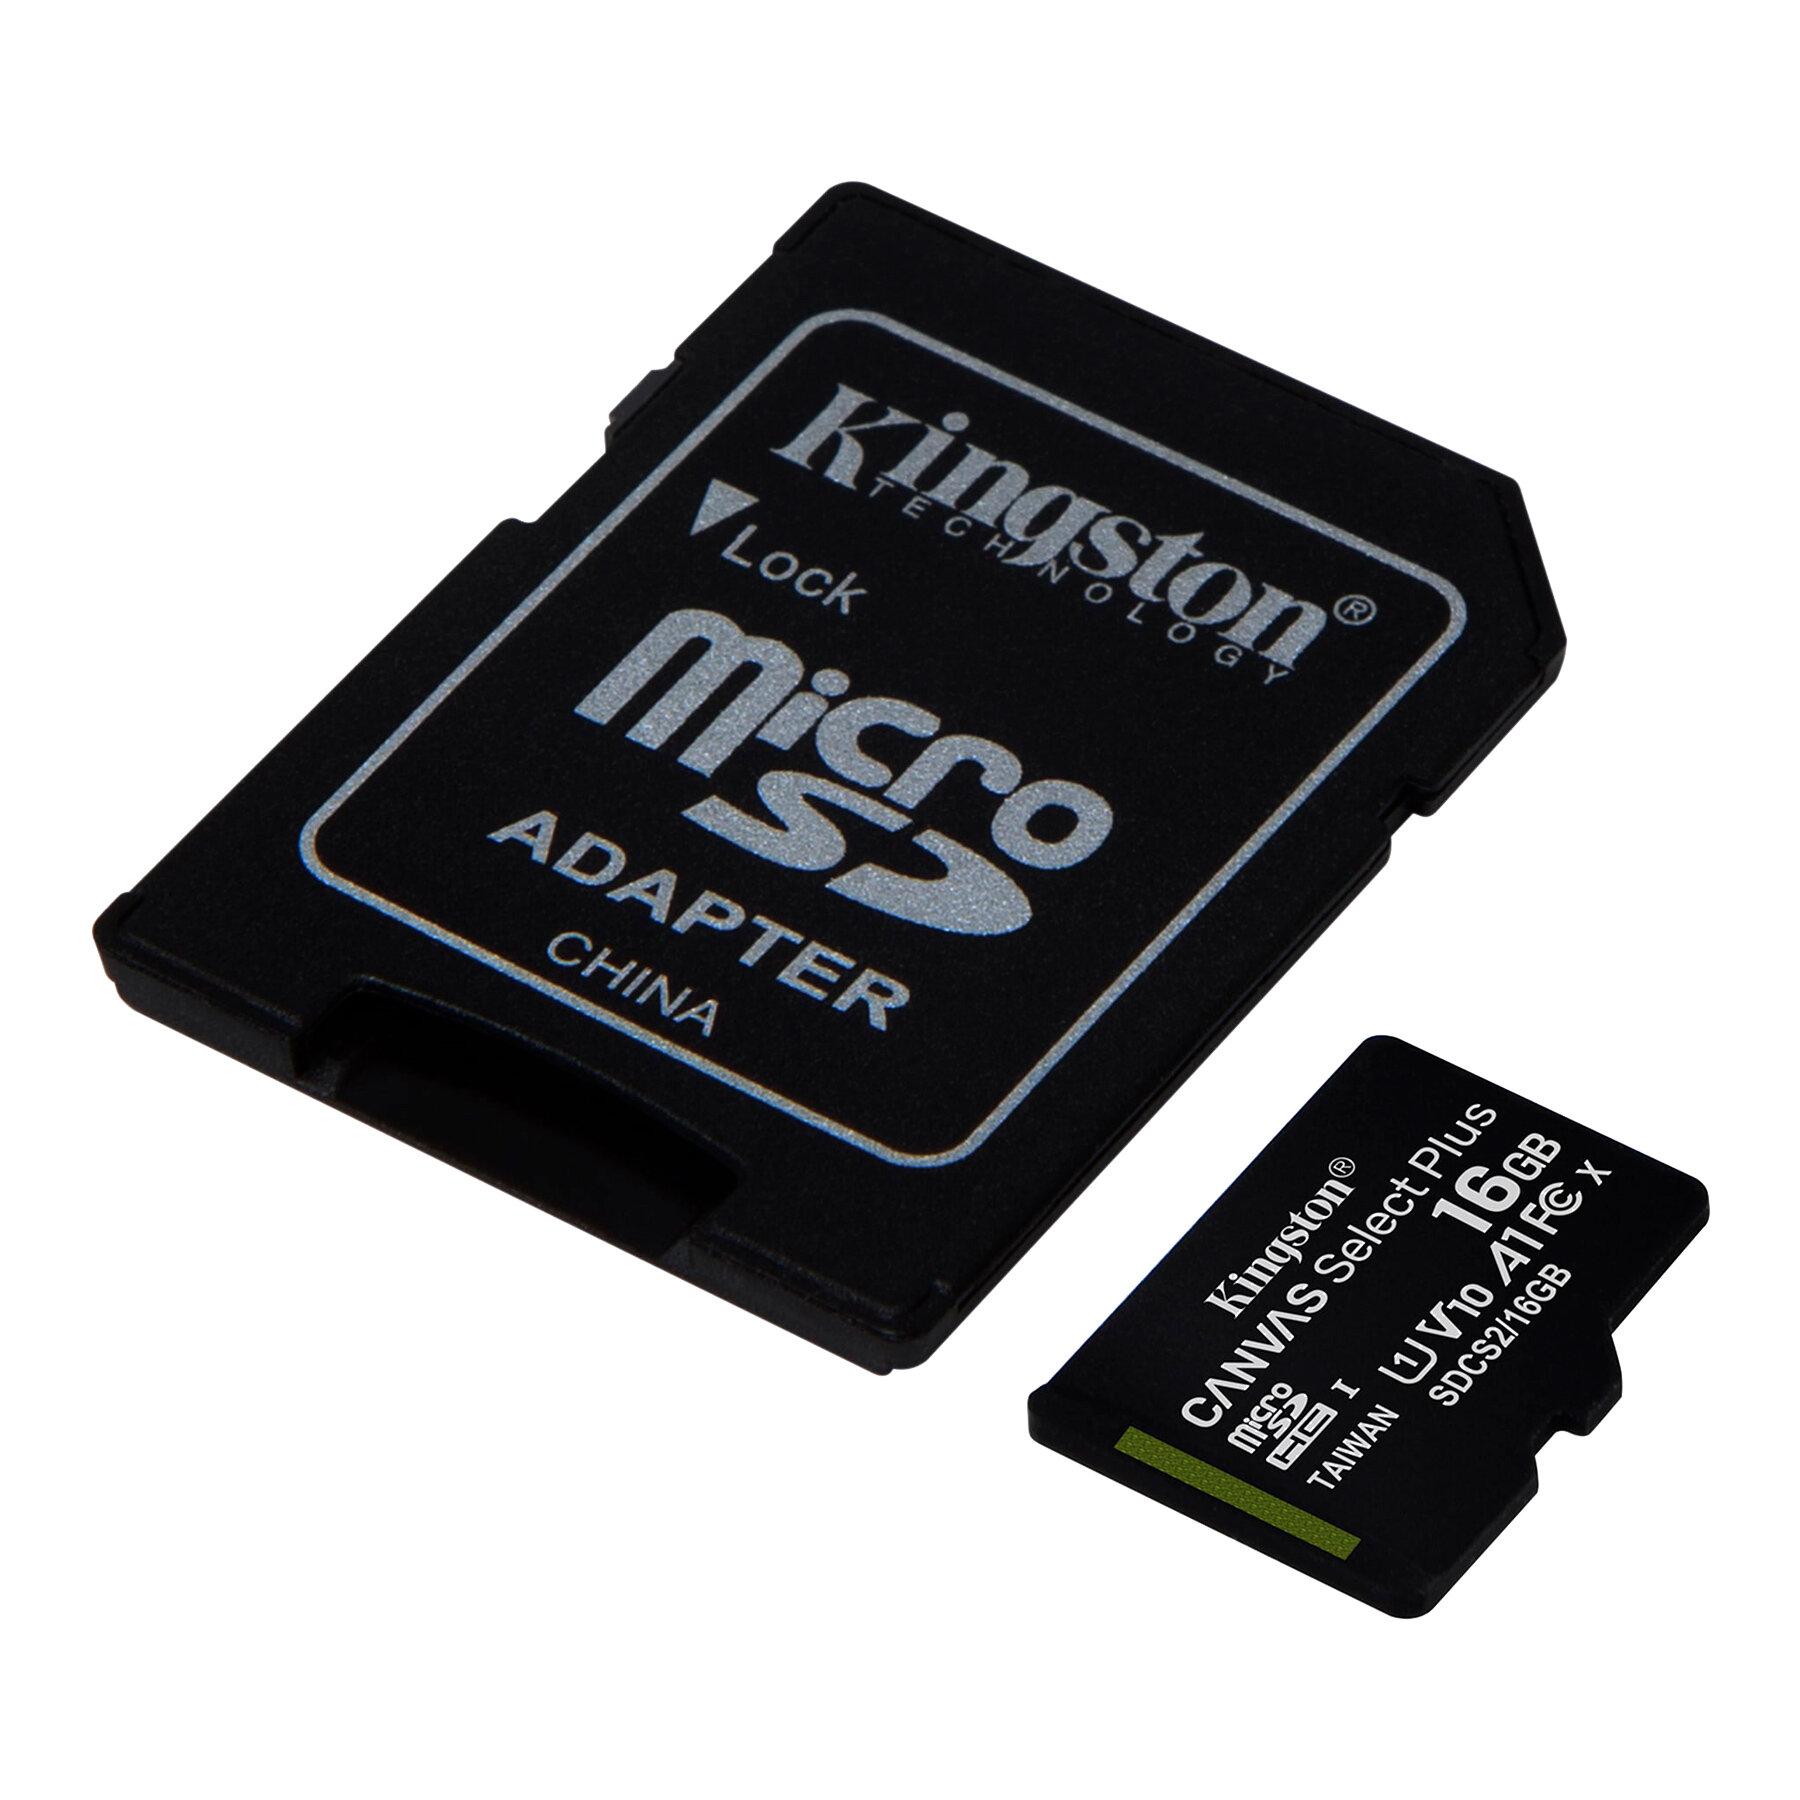 SDCS2/16GB | Kingston Technology 16GB UHS-I microSDHC Memory Card